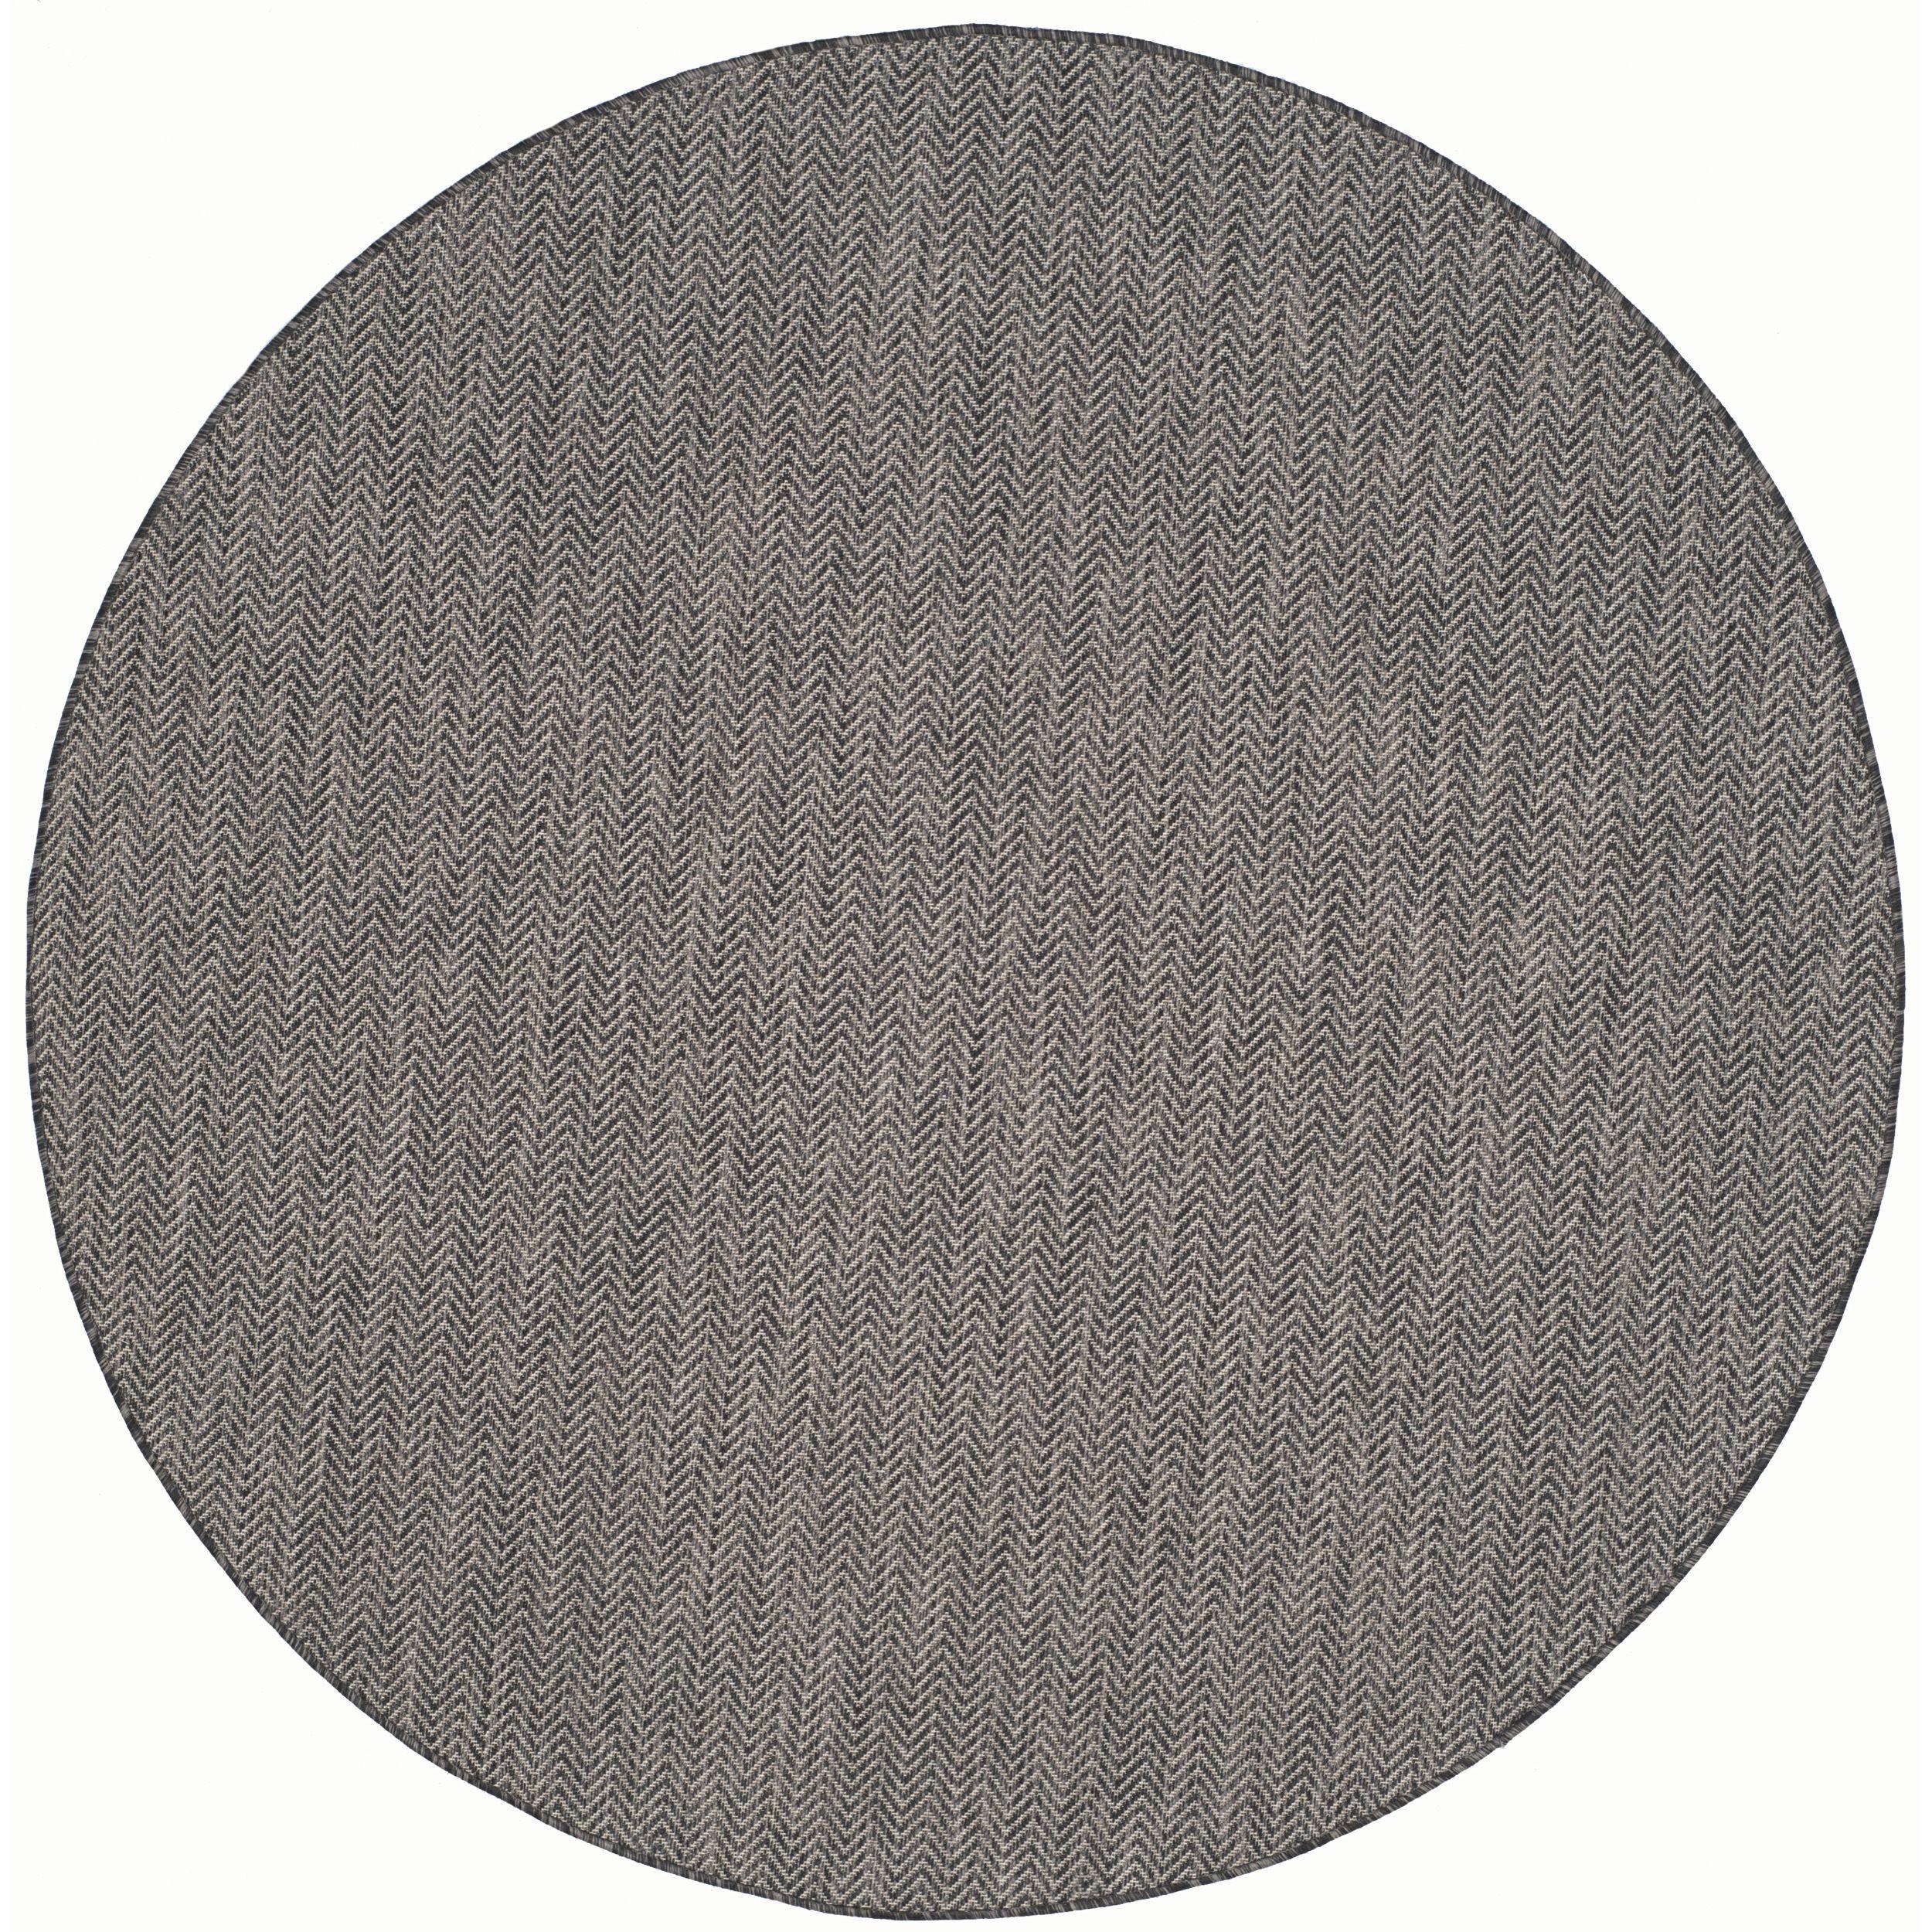 Safavieh indoor outdoor courtyard black beige rug u round